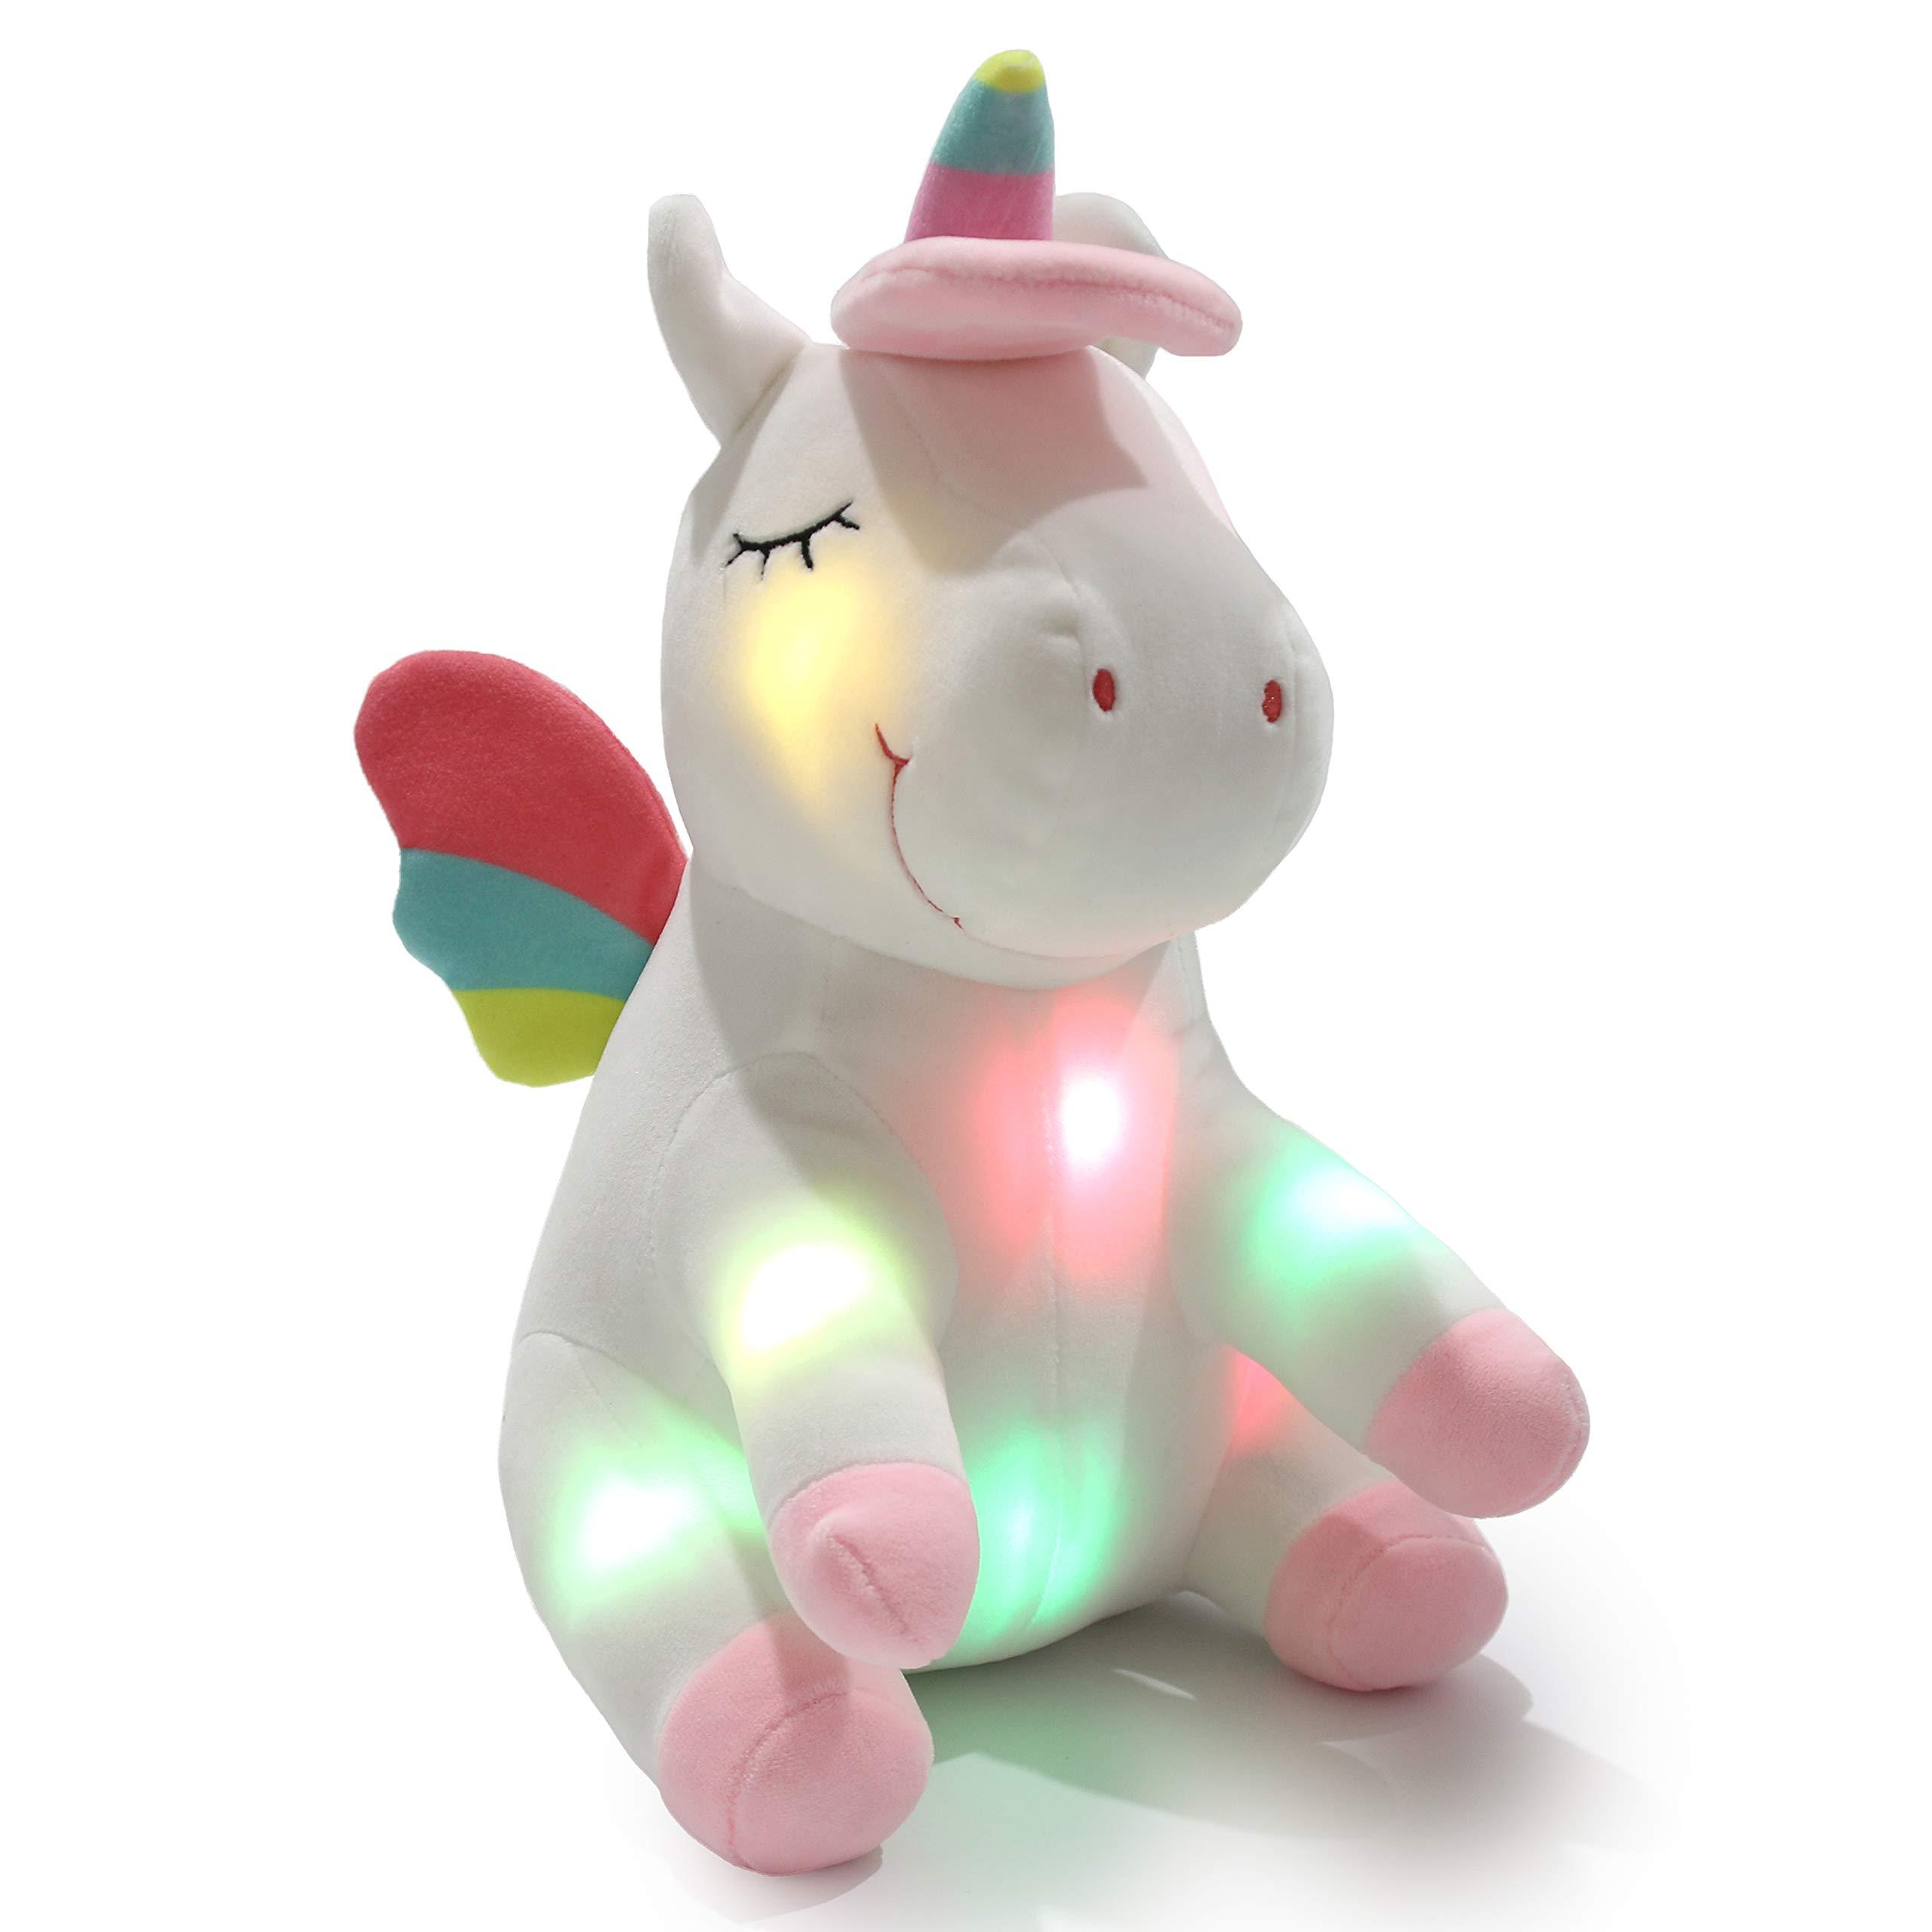 Athoinsu Light up Unicorn Soft Plush Toy LED Stuffed Animals with Colorful Night Lights Glowing Birthday for Toddler Girls Women, 12''